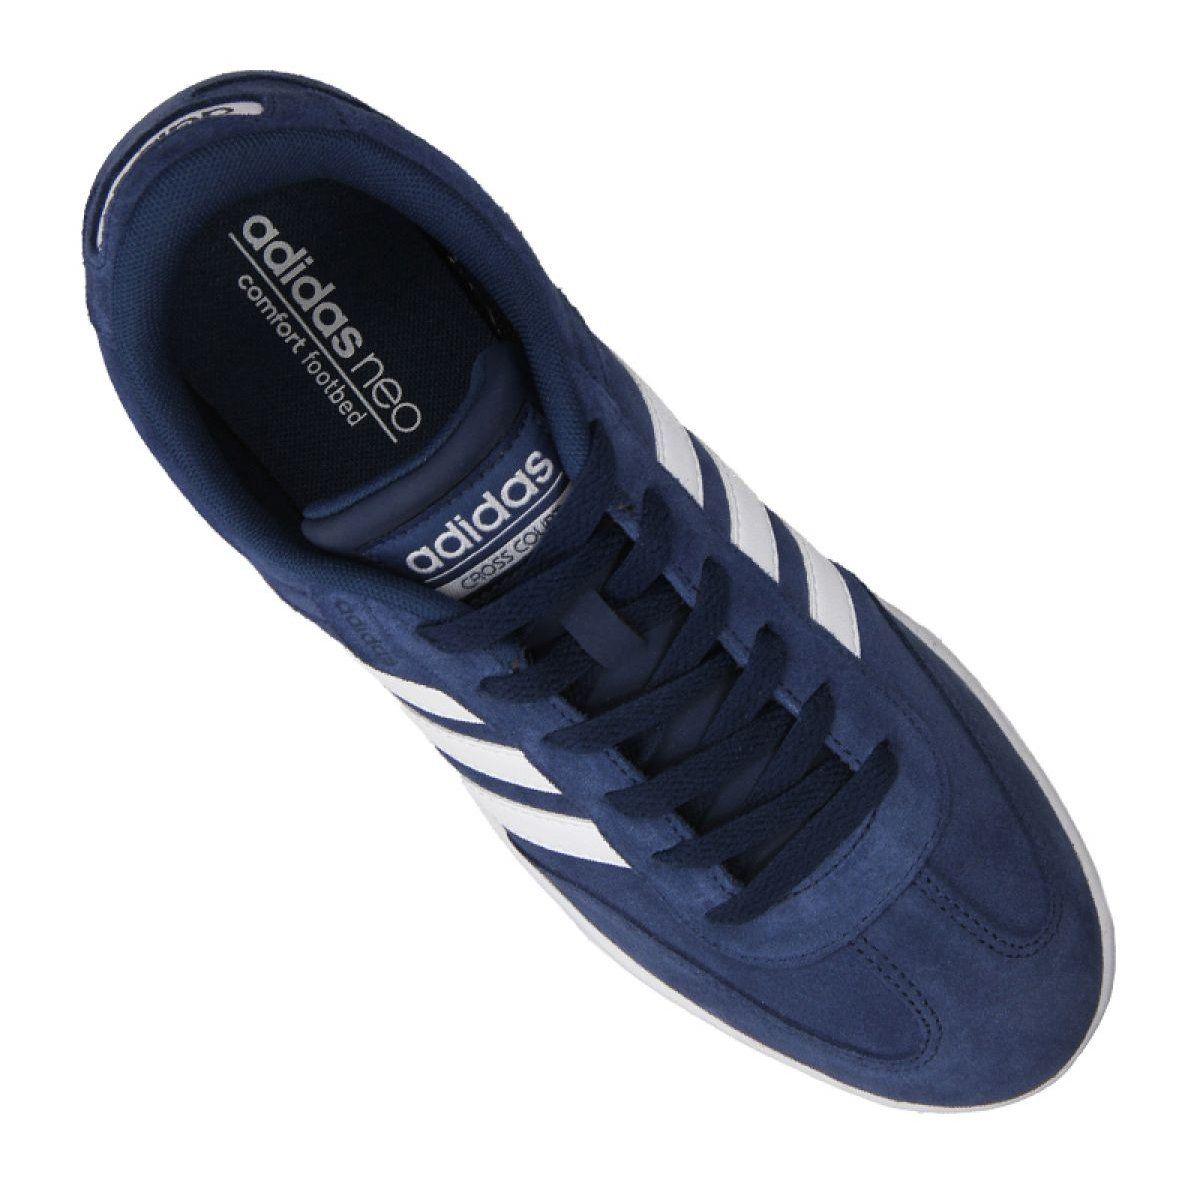 Adidas Cross Court M B74444 shoes navy